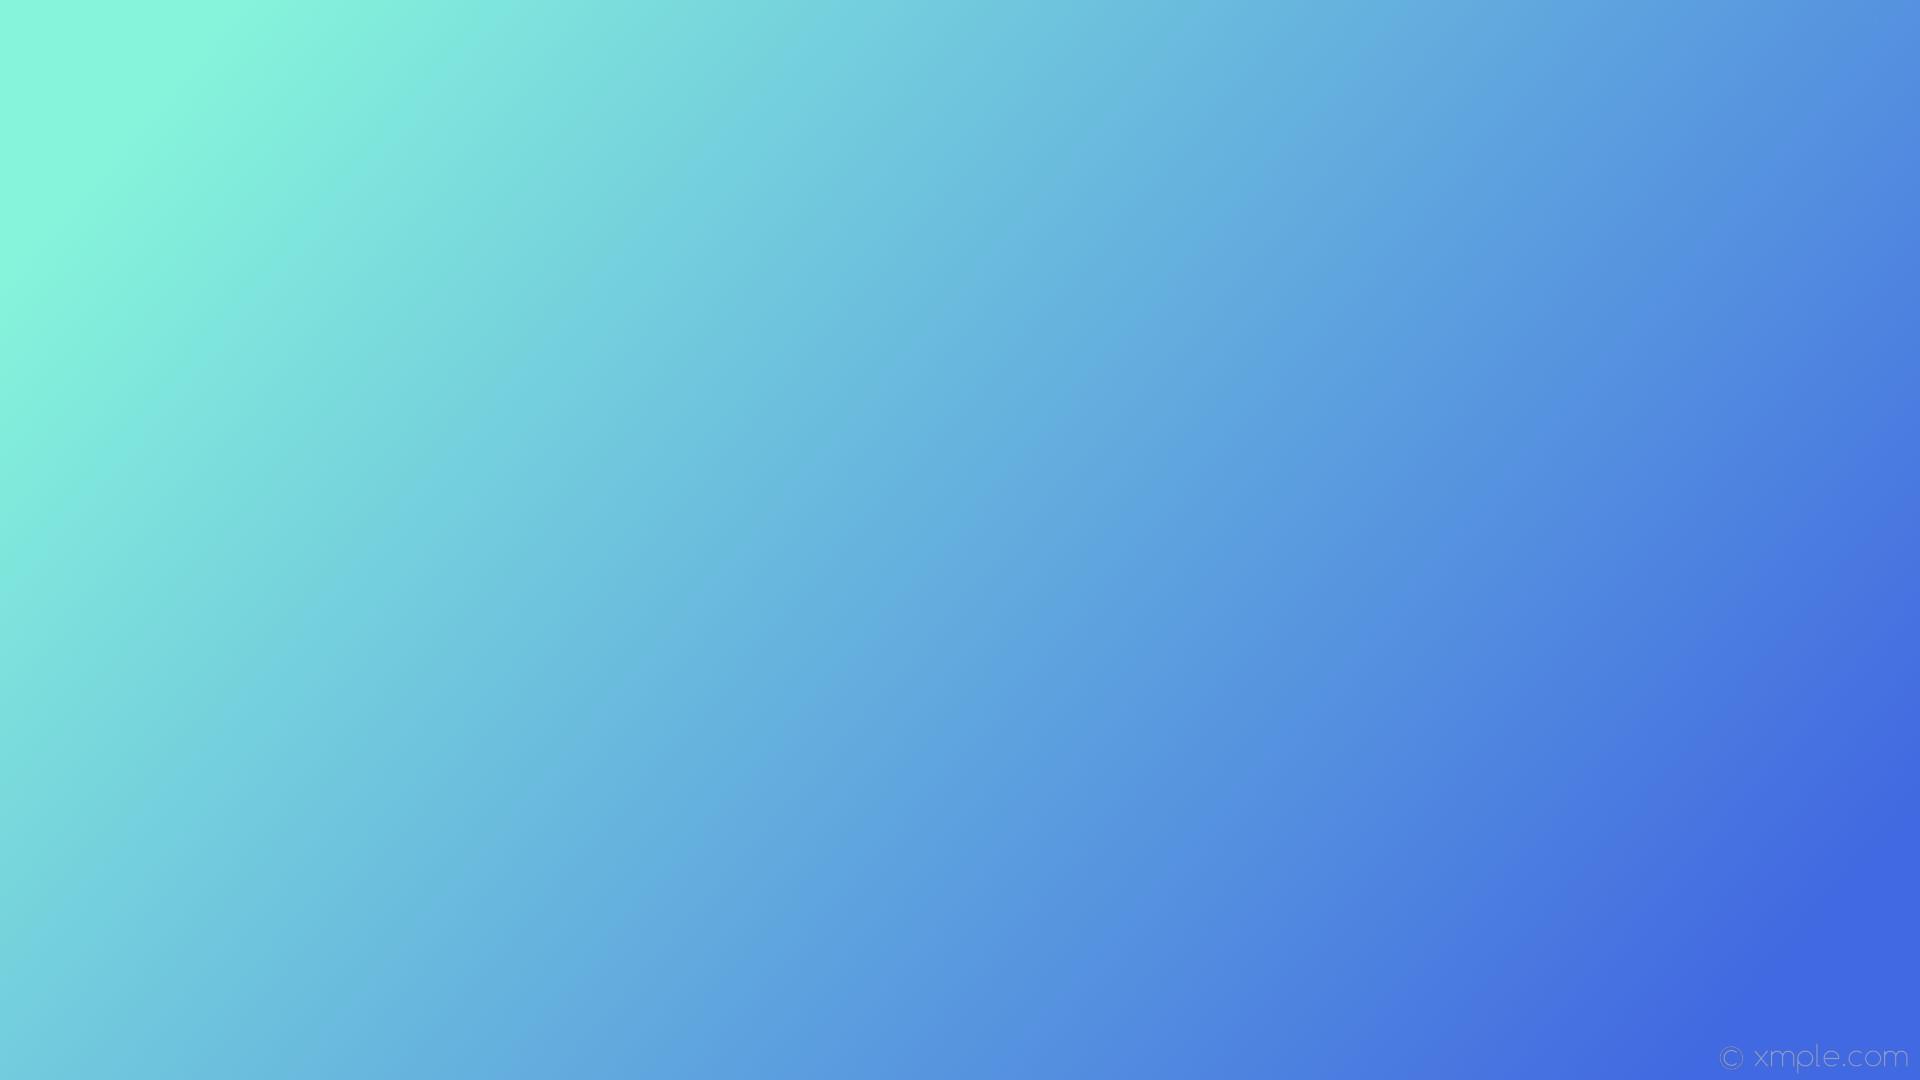 wallpaper cyan blue gradient linear royal blue #86f4db #4169e1 165°